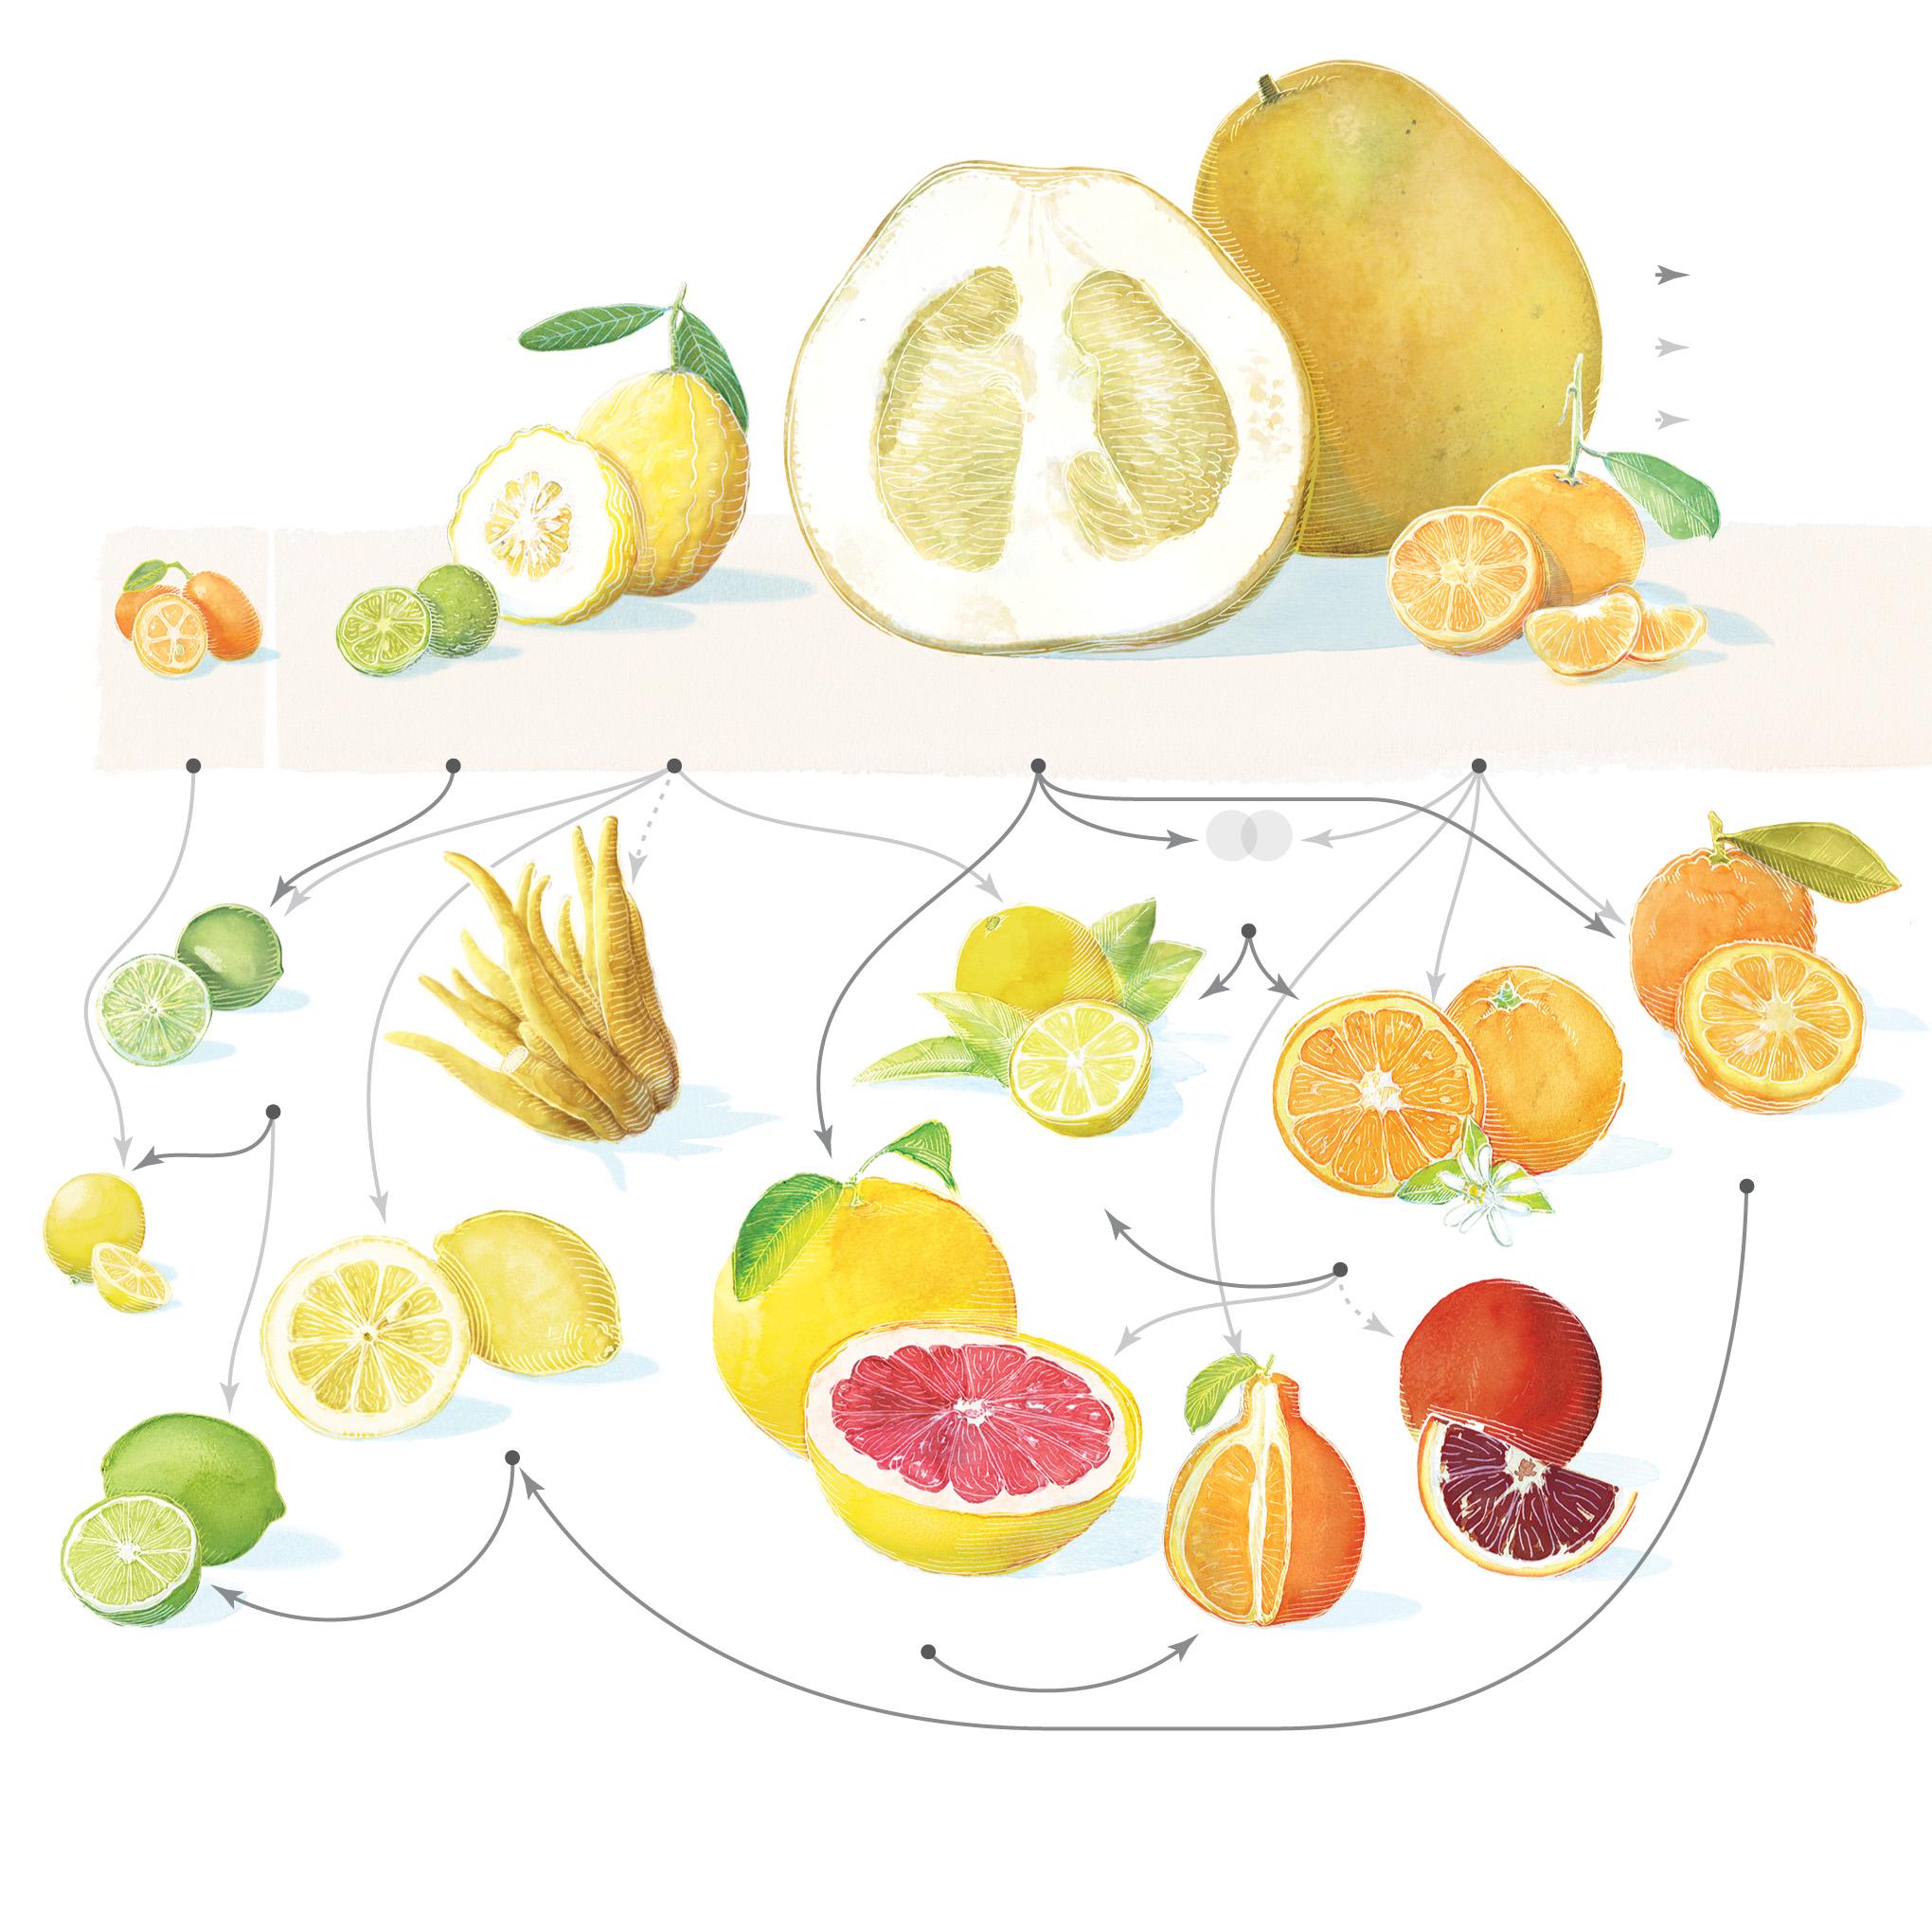 The Citrus Family Tree